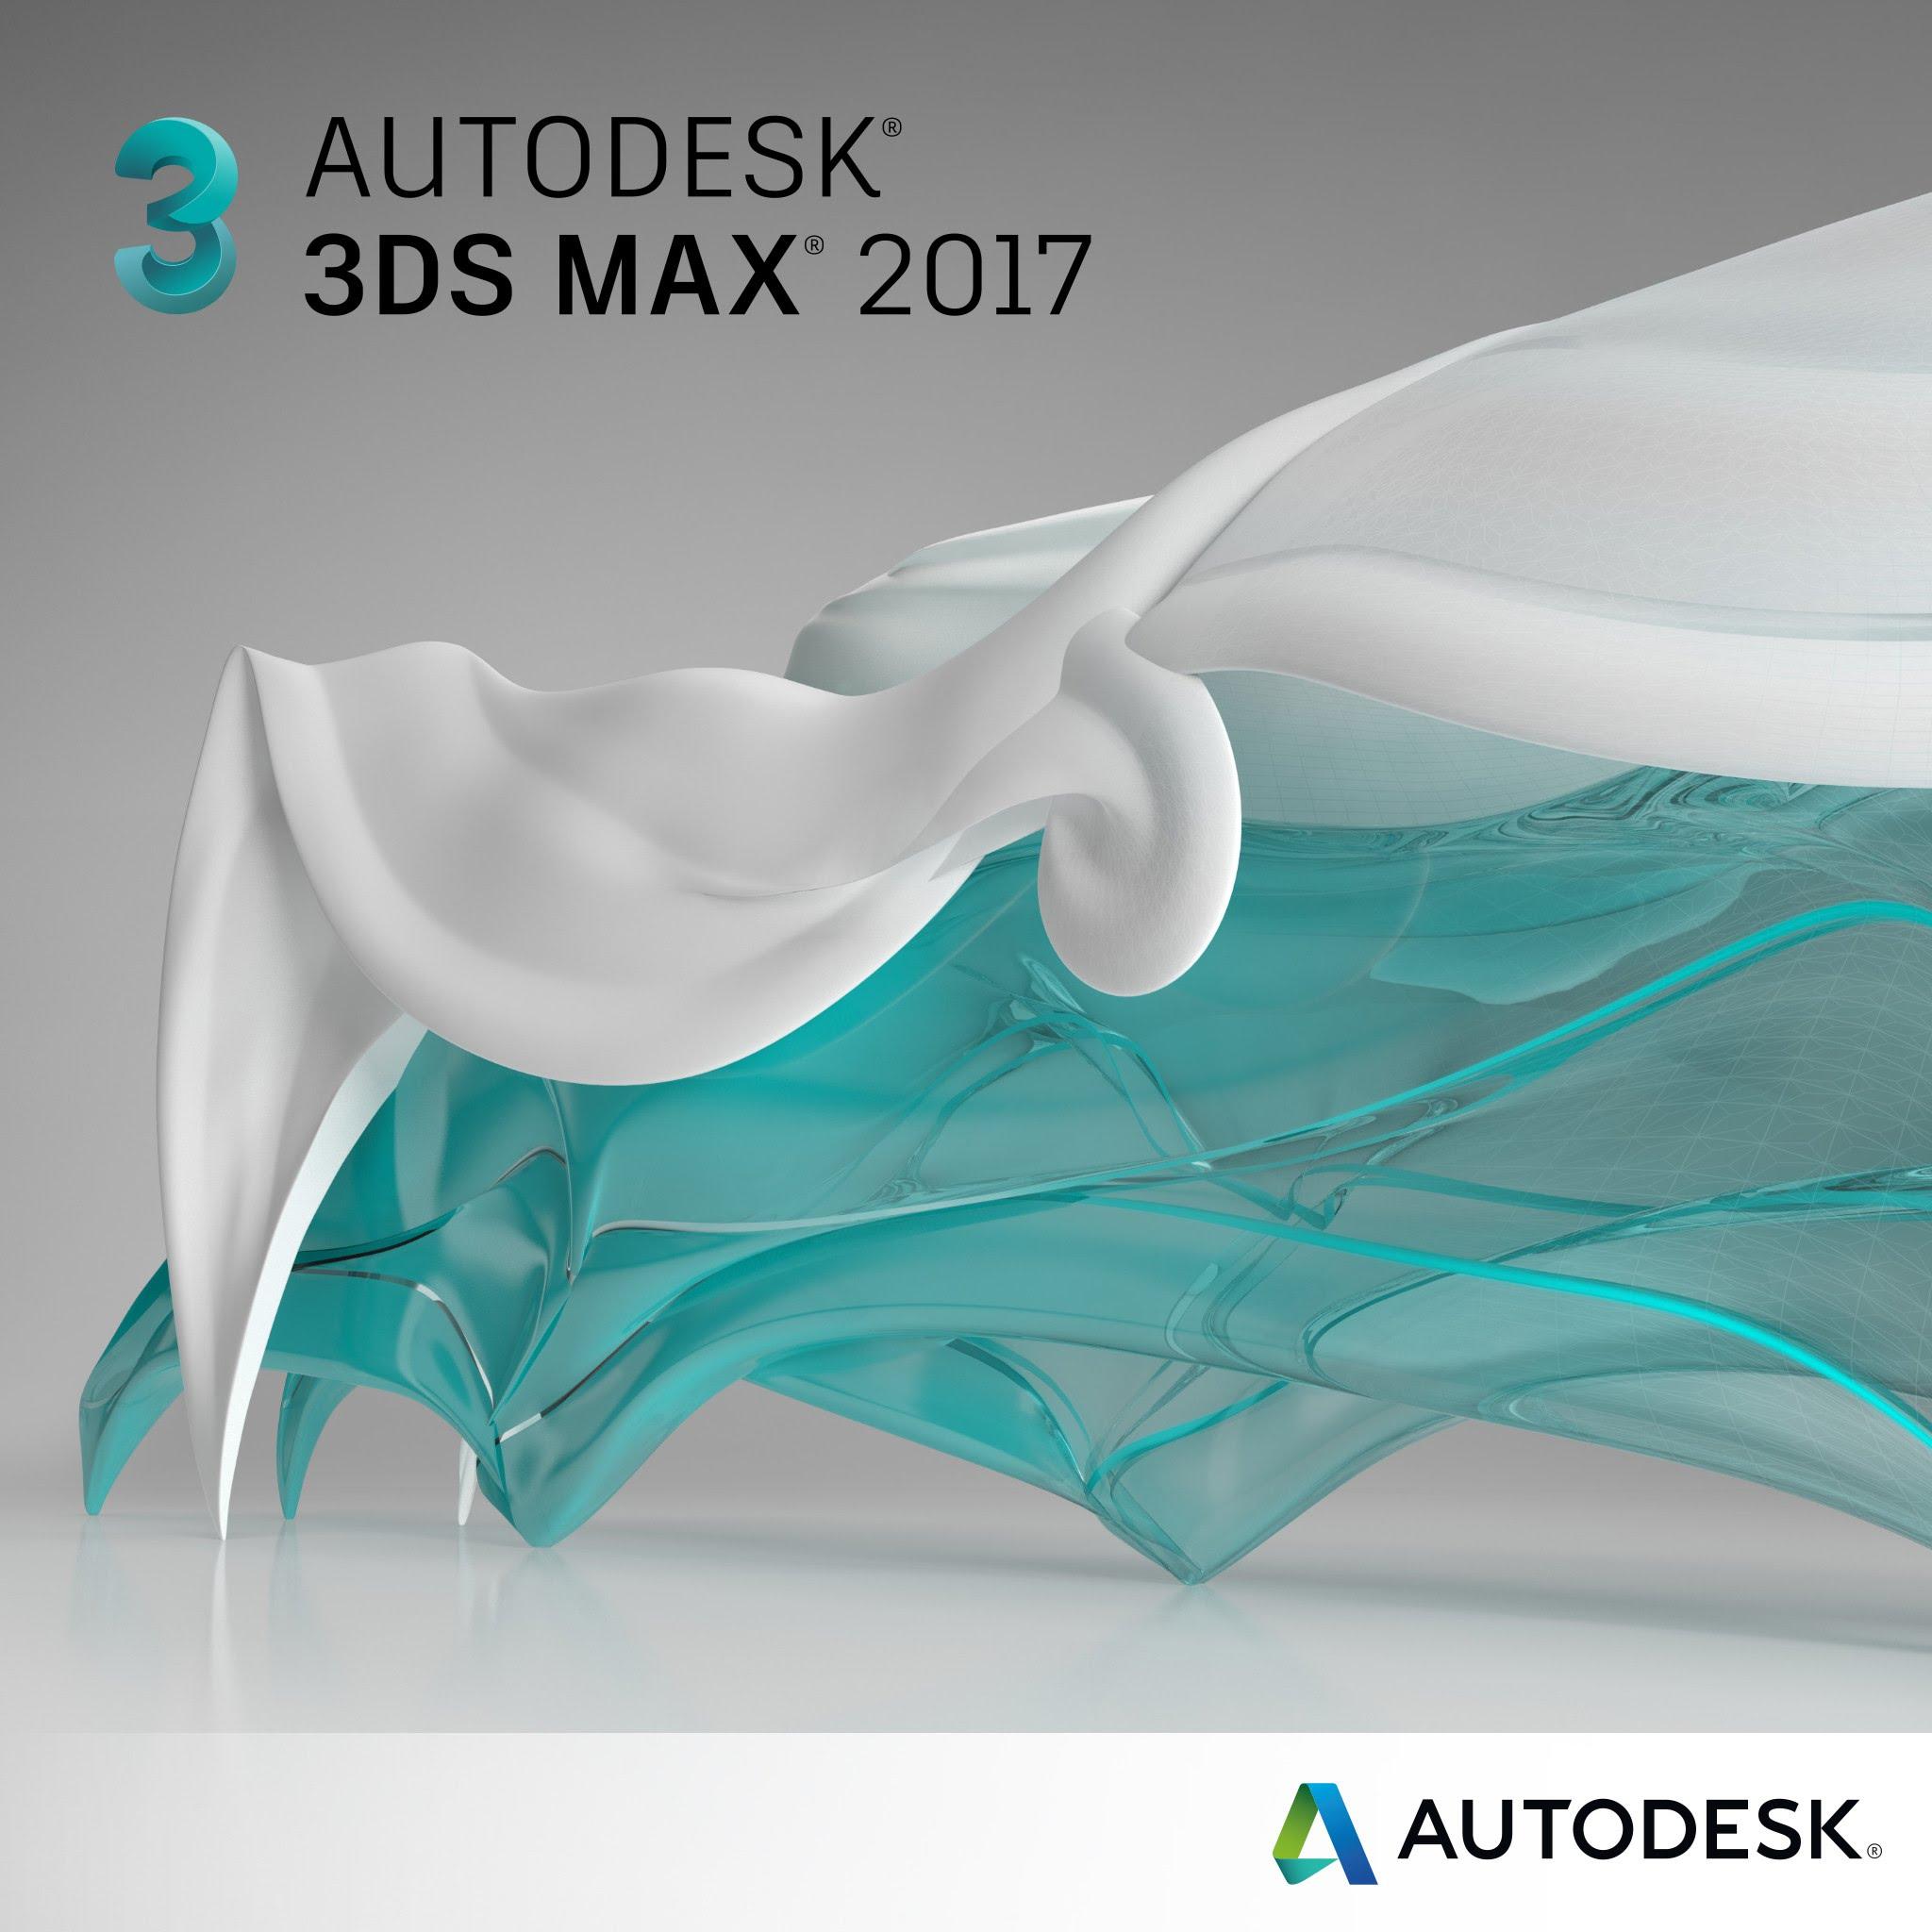 Tag: Autodesk 3DS MAX là gì?